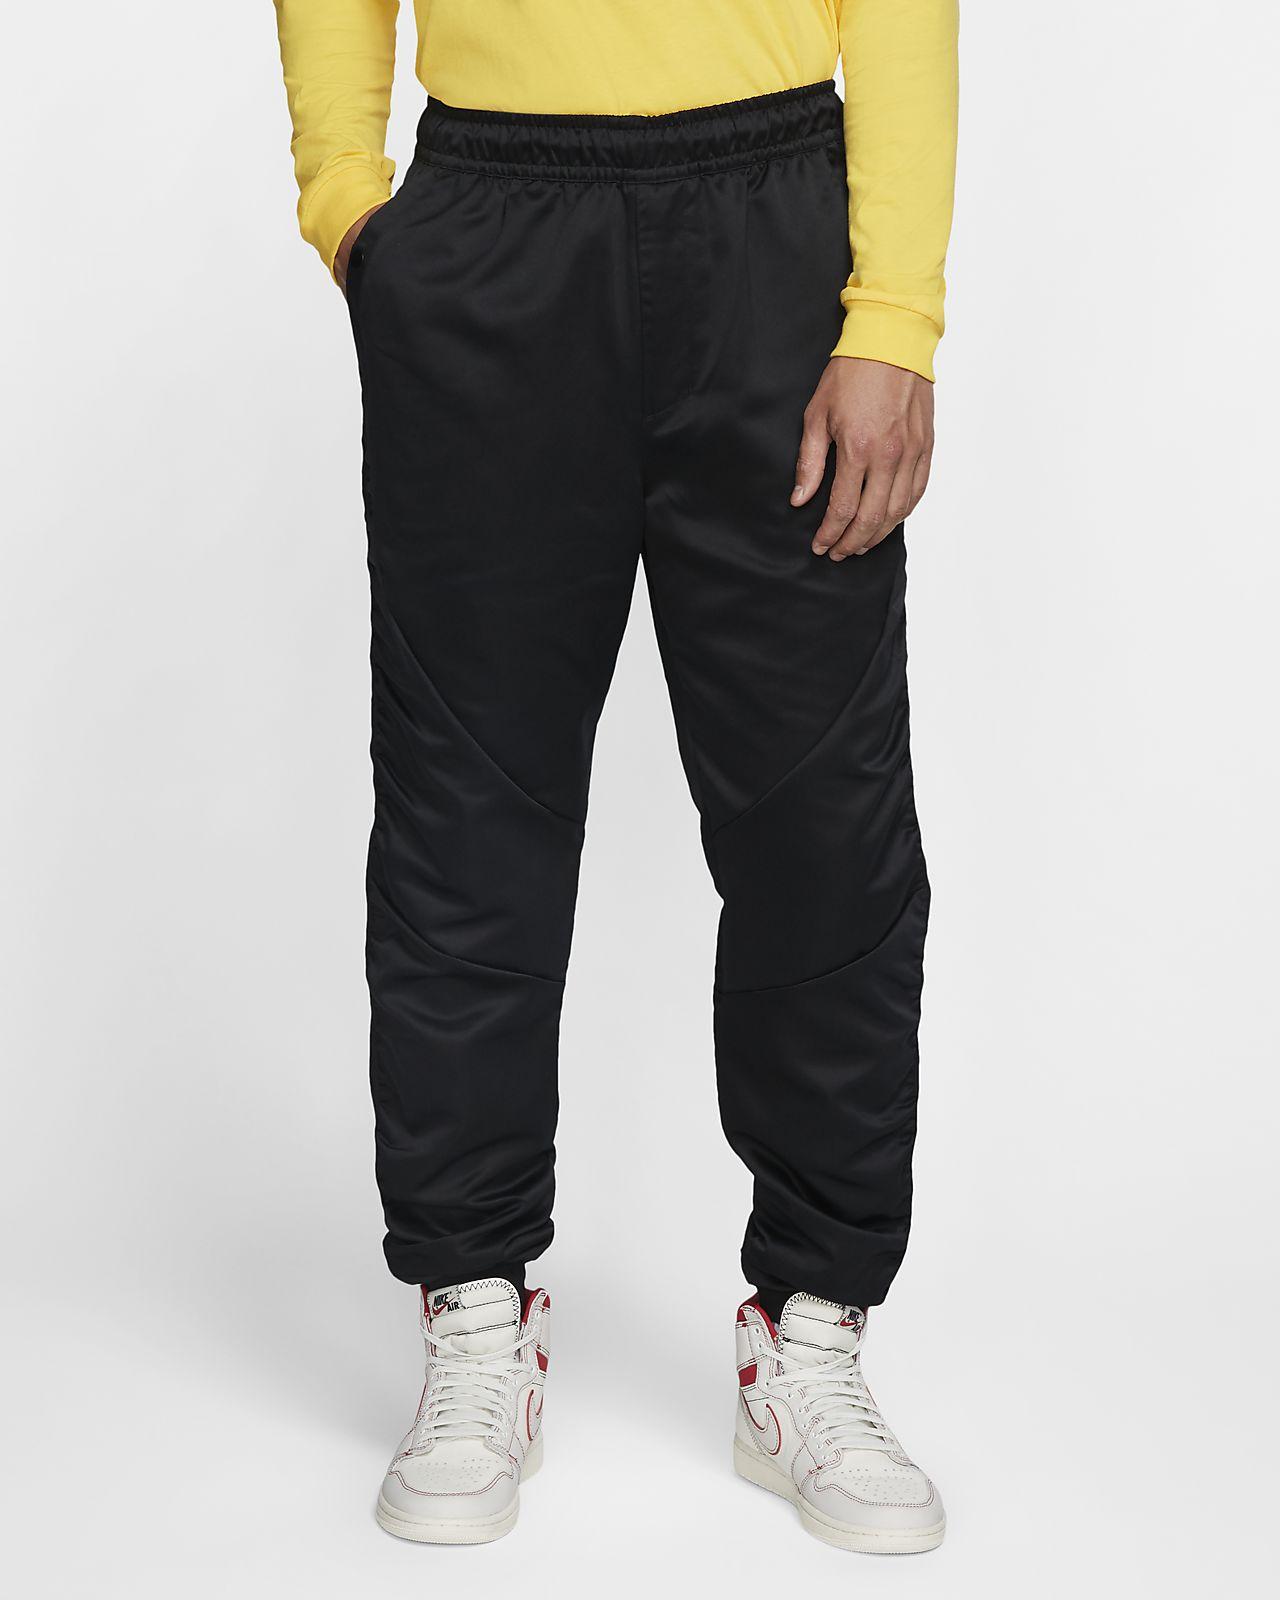 Pantalones Flight Suit para hombre Jordan Black Cat